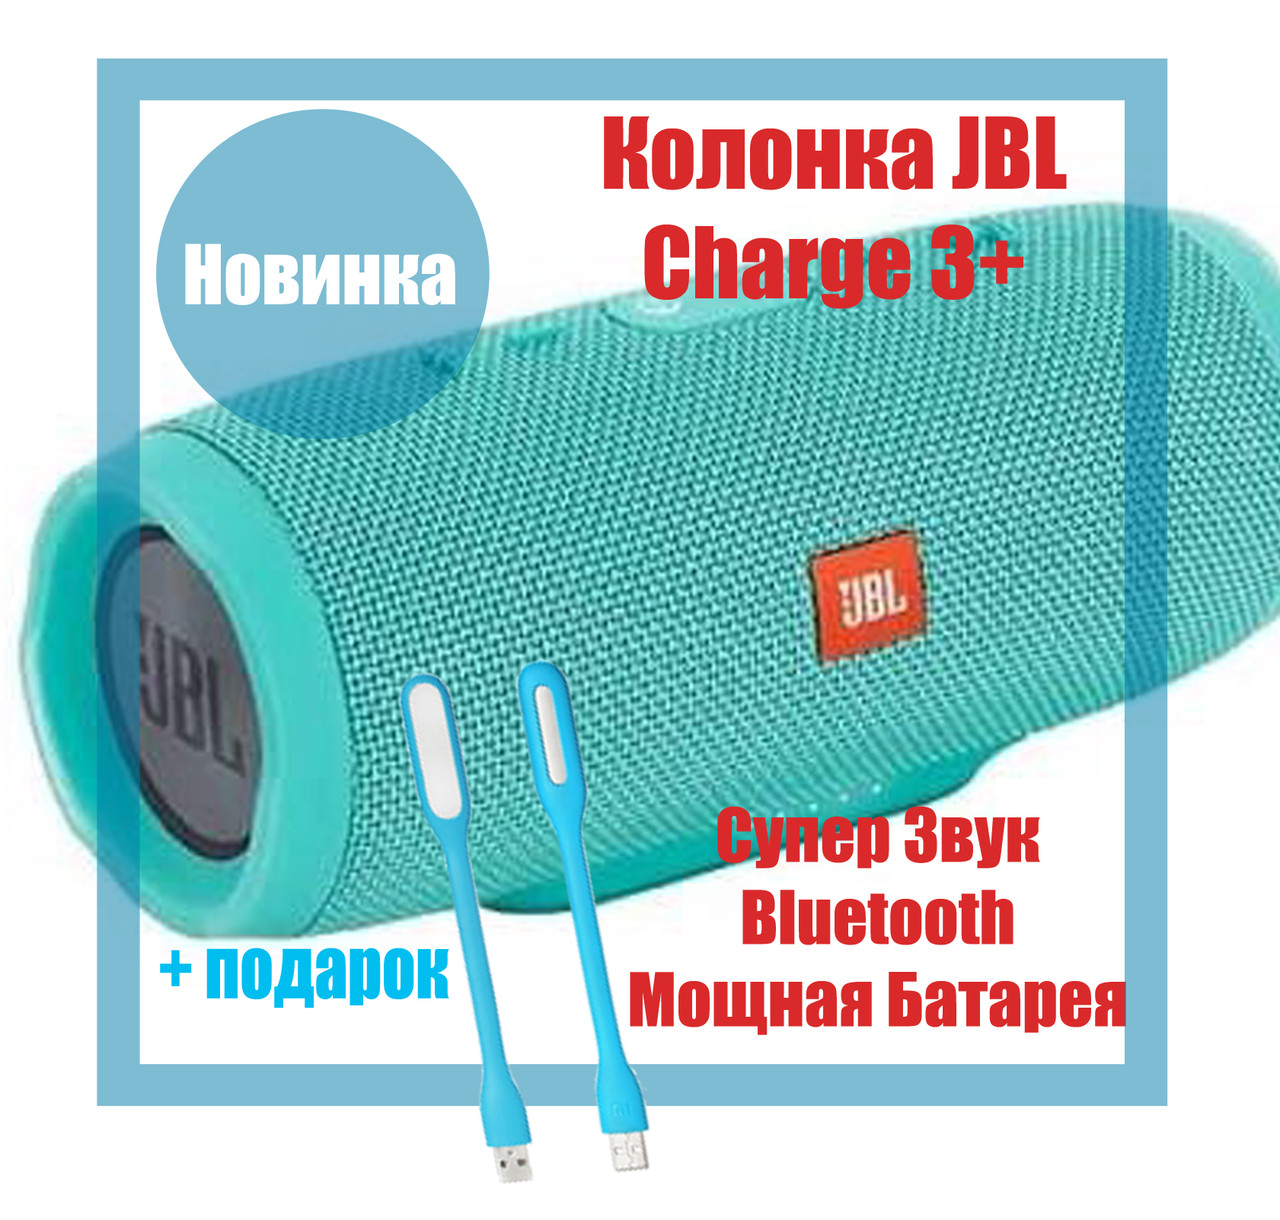 Колонка JBL Charge 3+ Bluetooth влагозащита, microSD, PowerBank, 20W качество Quality Replica